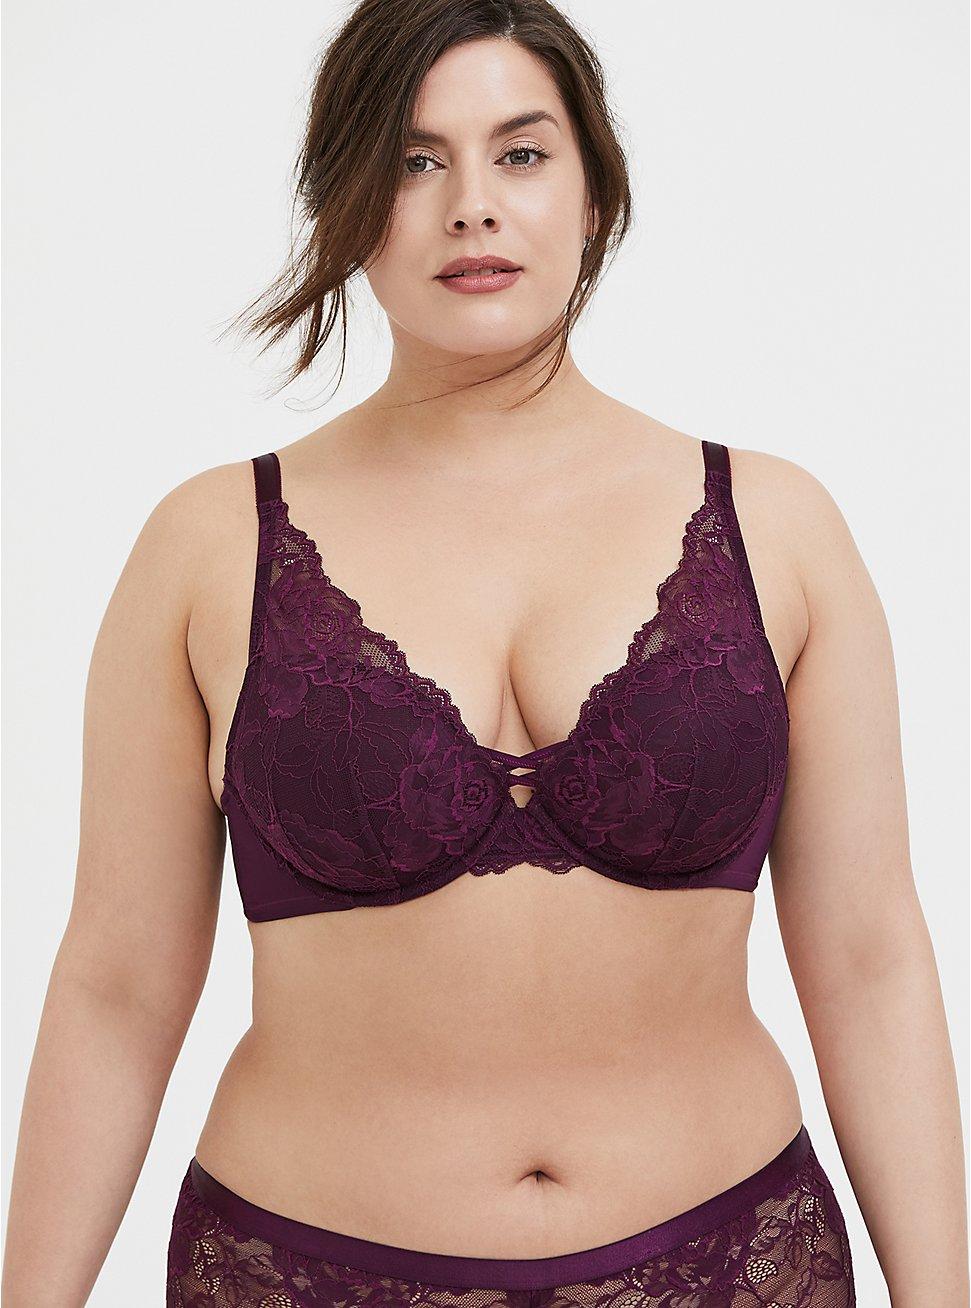 Grape Purple Lace XO Push-Up Plunge Bra, POTENT PURPLE, hi-res